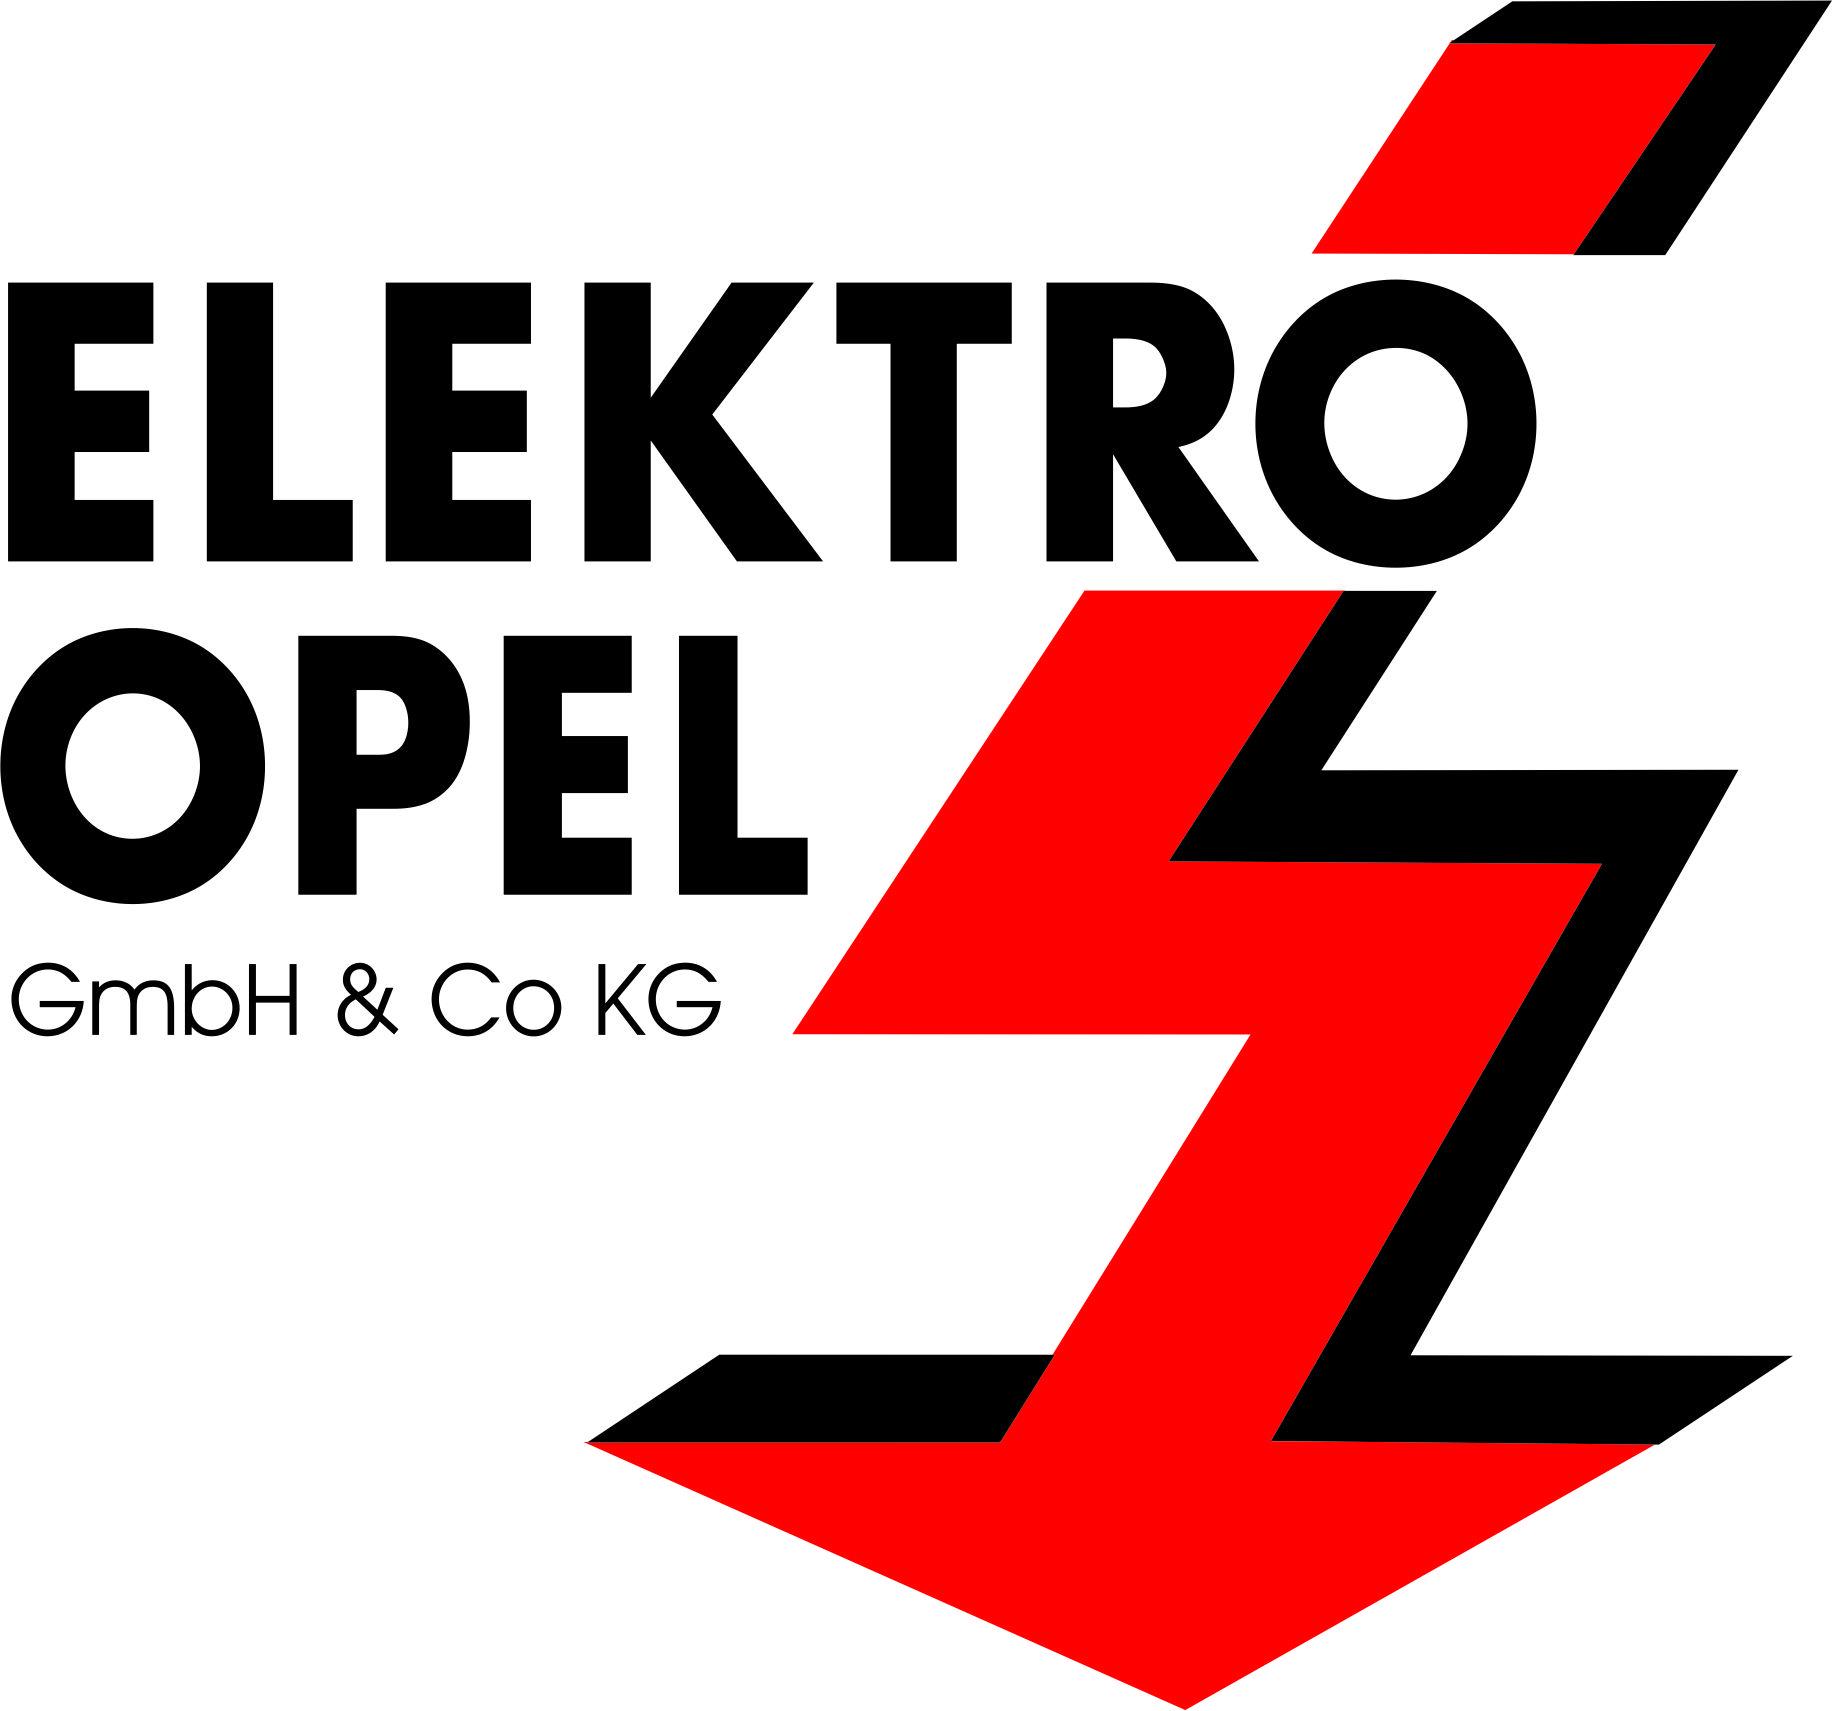 Elektro-Opel GmbH & Co KG – Gersdorf